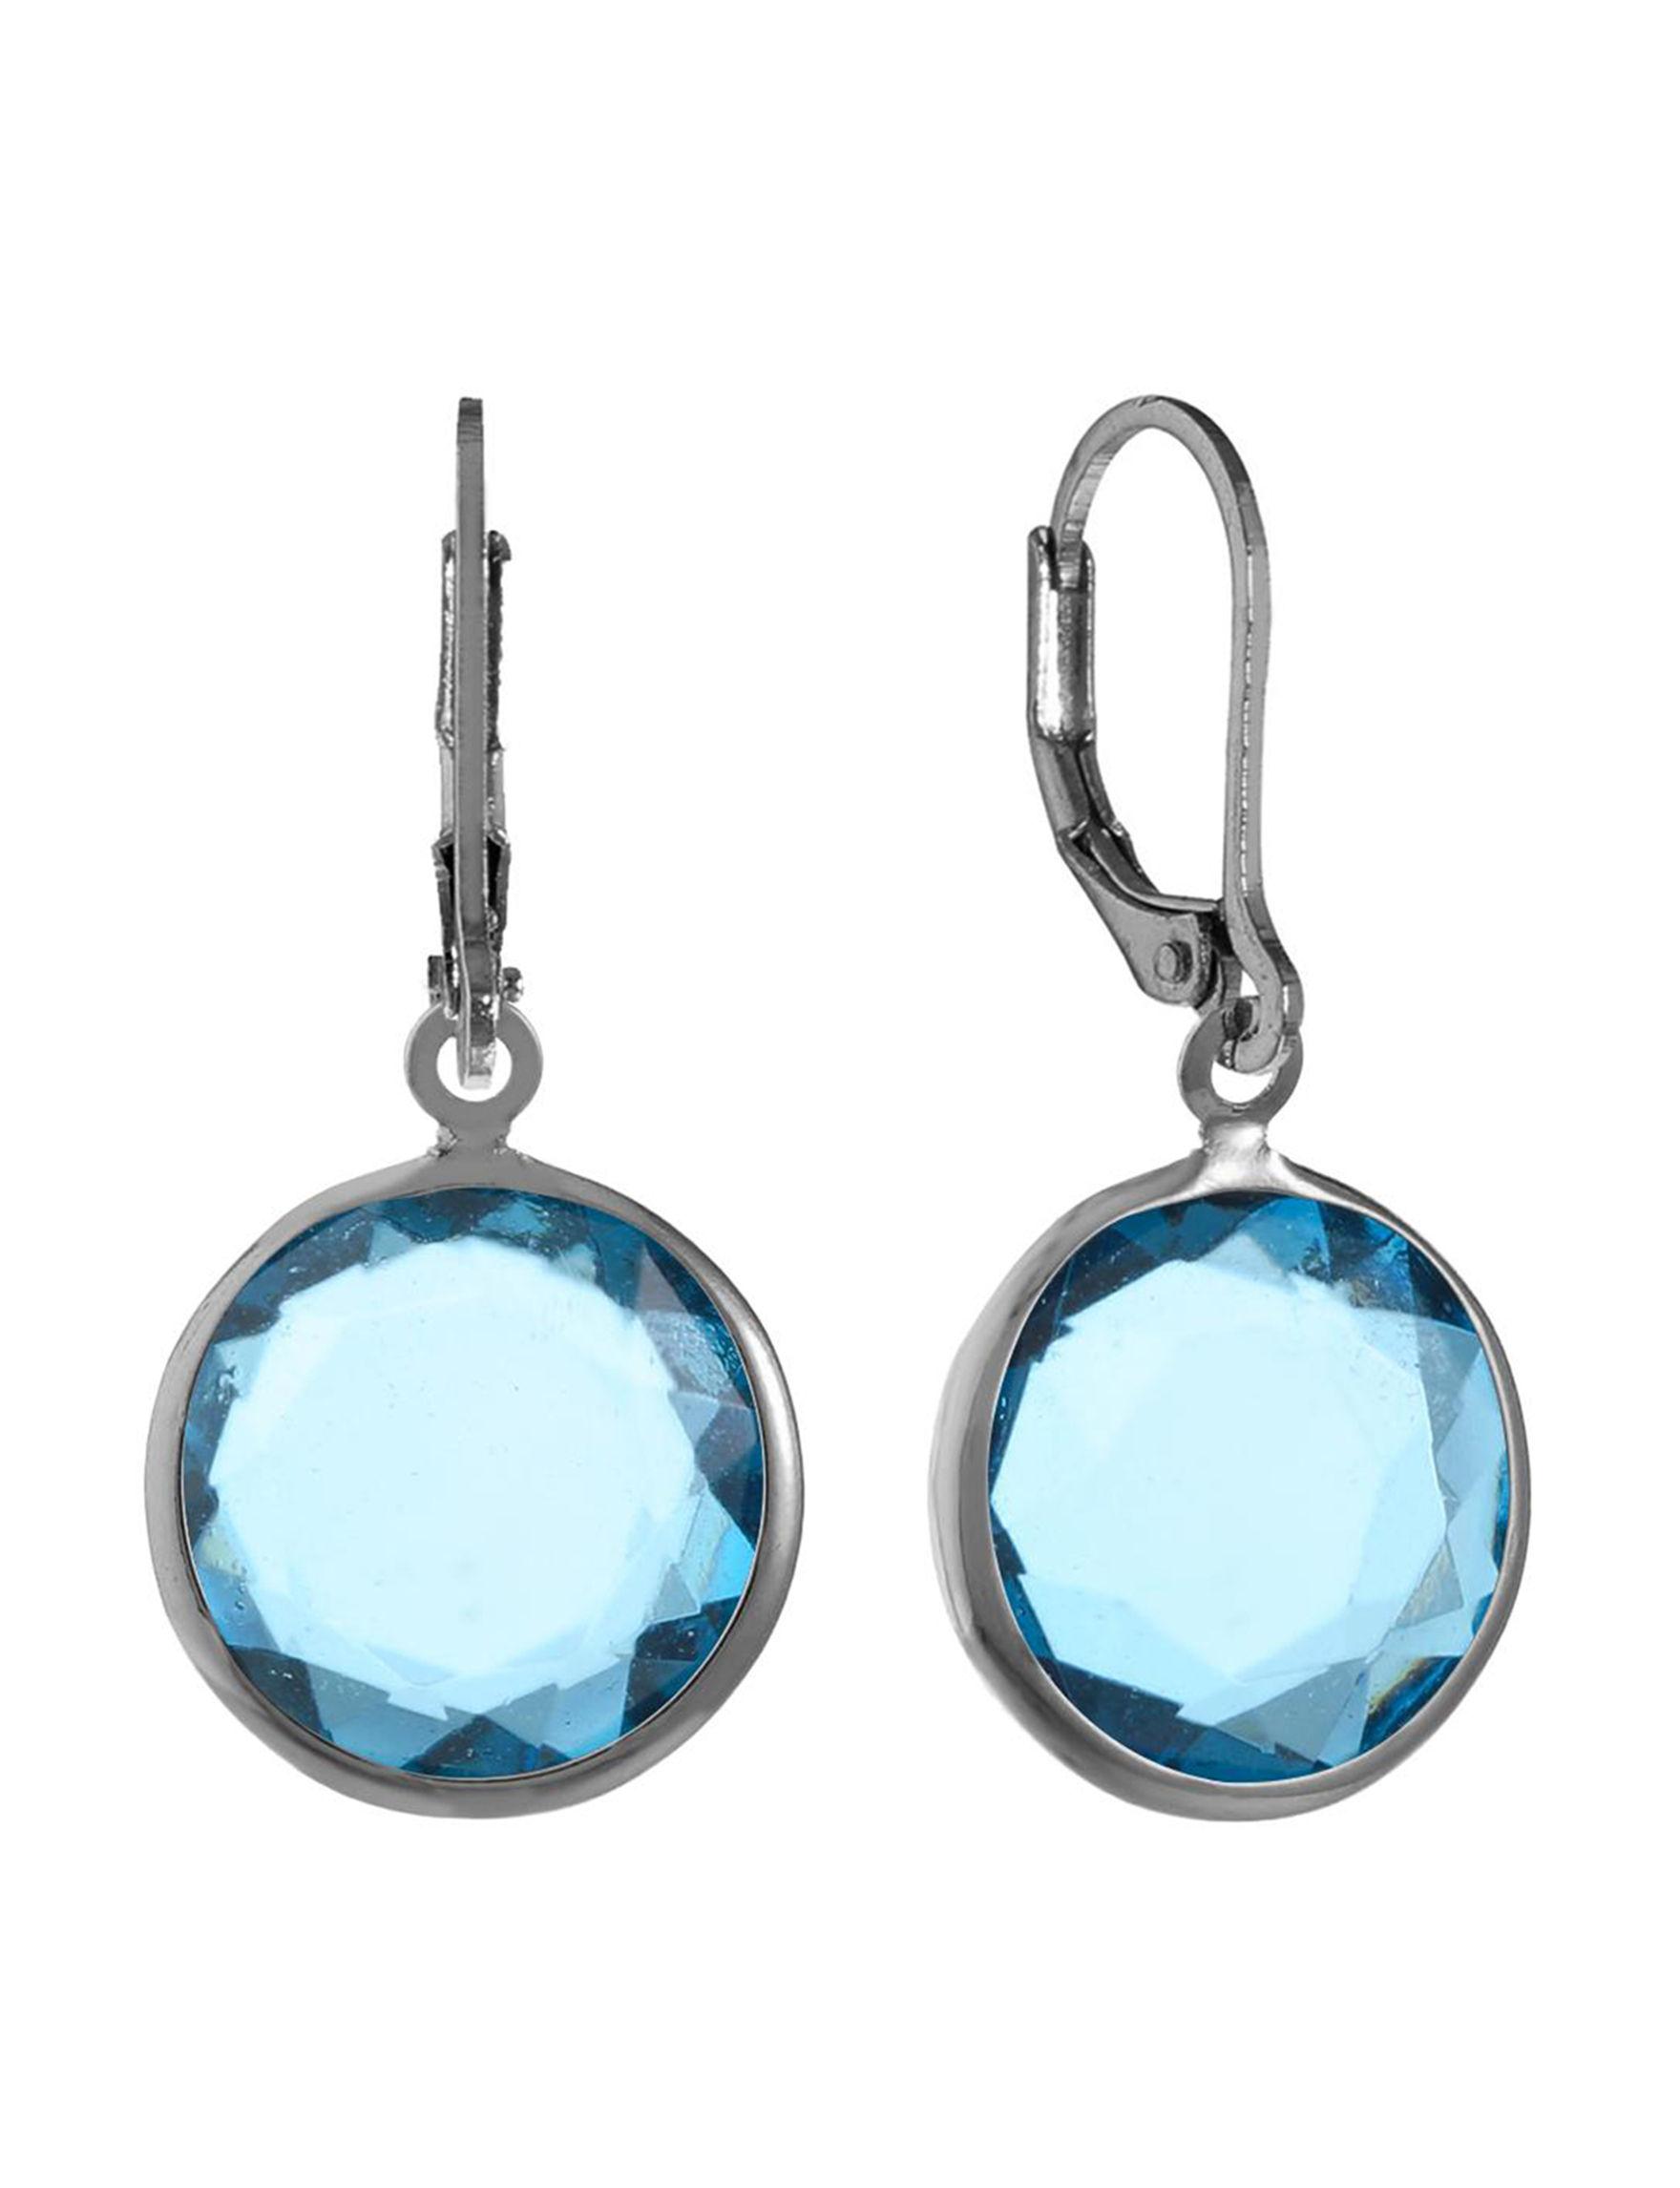 Gloria Vanderbilt Silver / Blue Stone Drops Earrings Fashion Jewelry